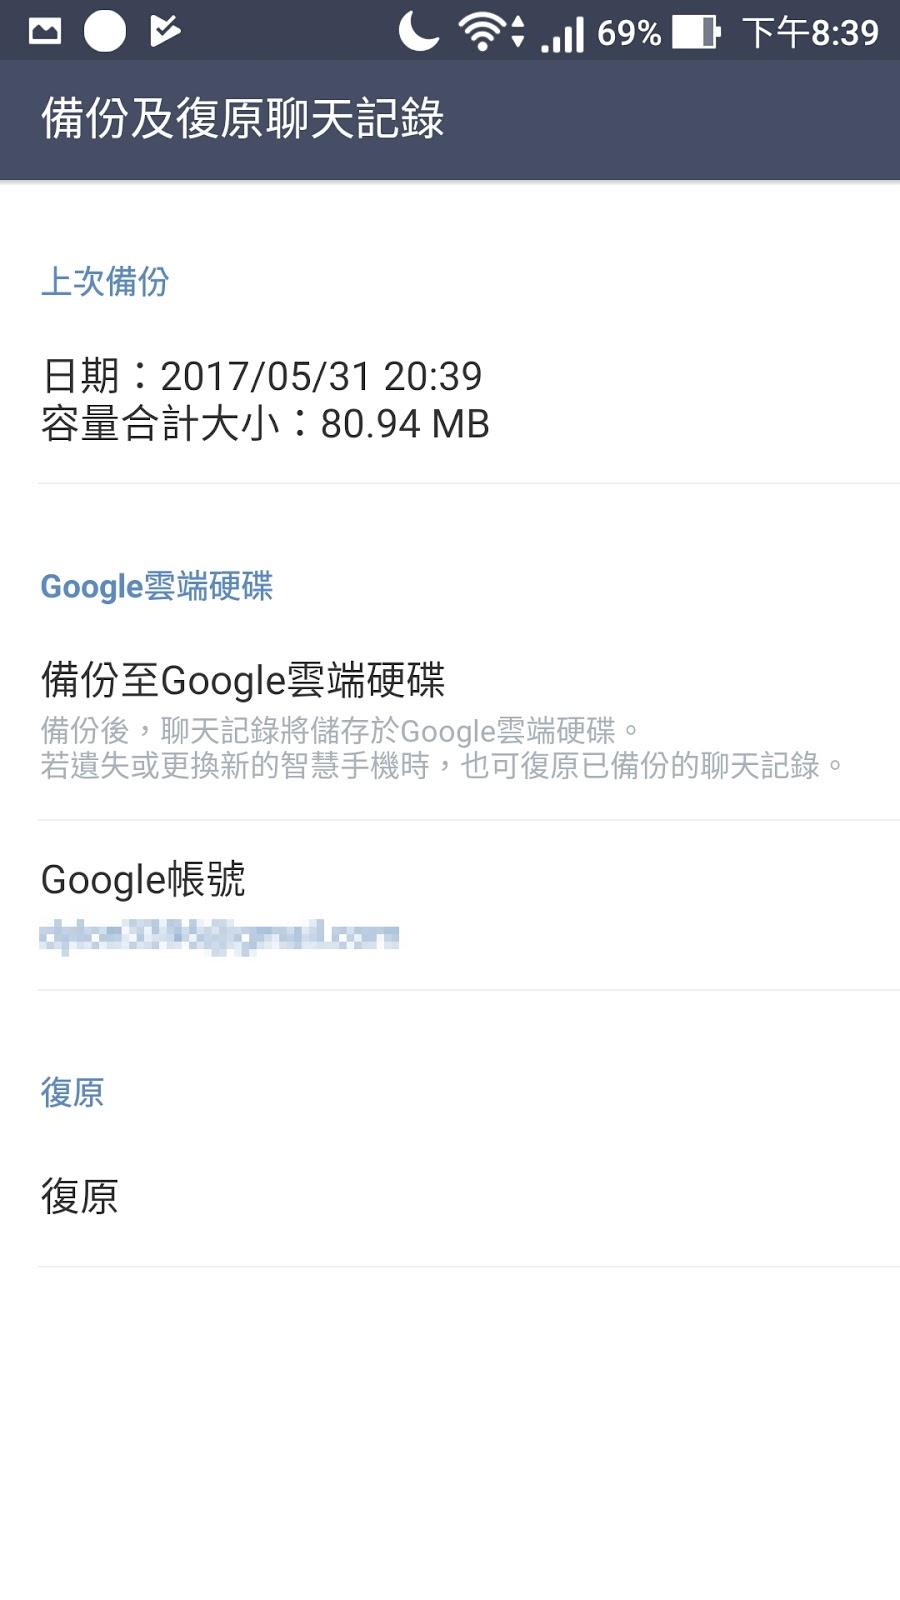 Screenshot 20170531 203947 - [教學] Line 終於開放 Android 使用者「雲端備份」聊天紀錄!趕快來更新吧!